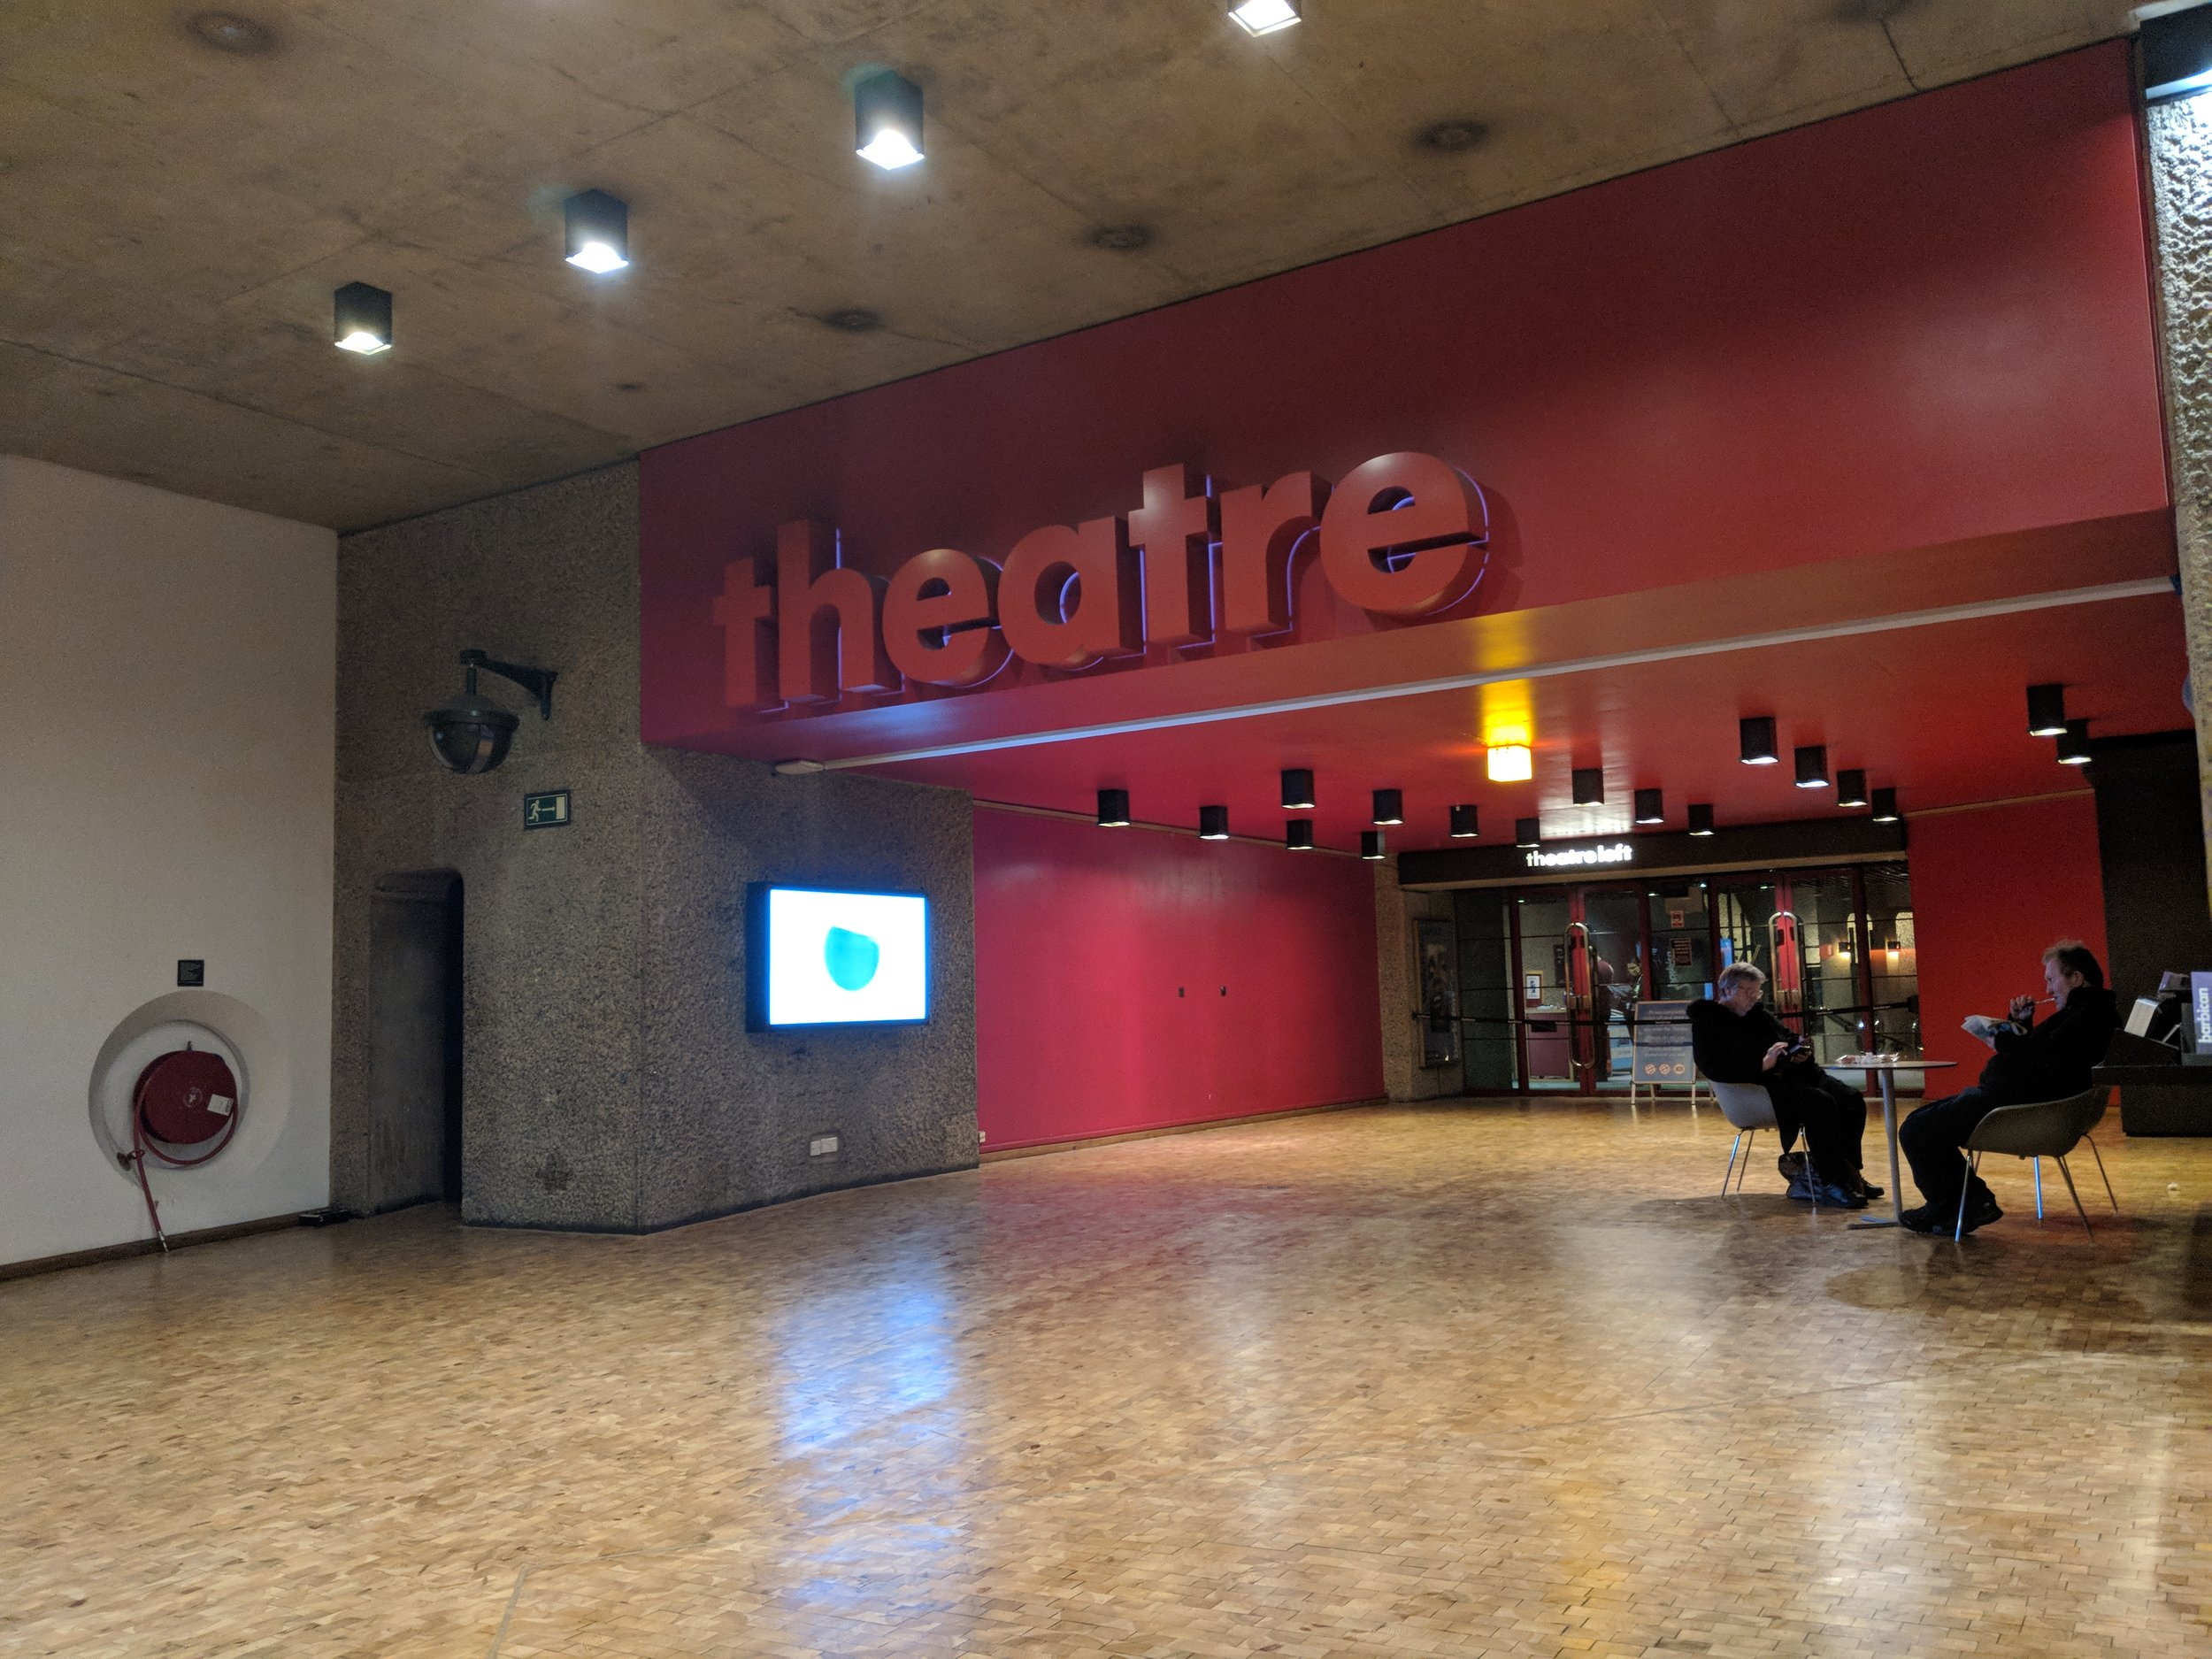 Barbican(Theatre) - visited 08/03/2019